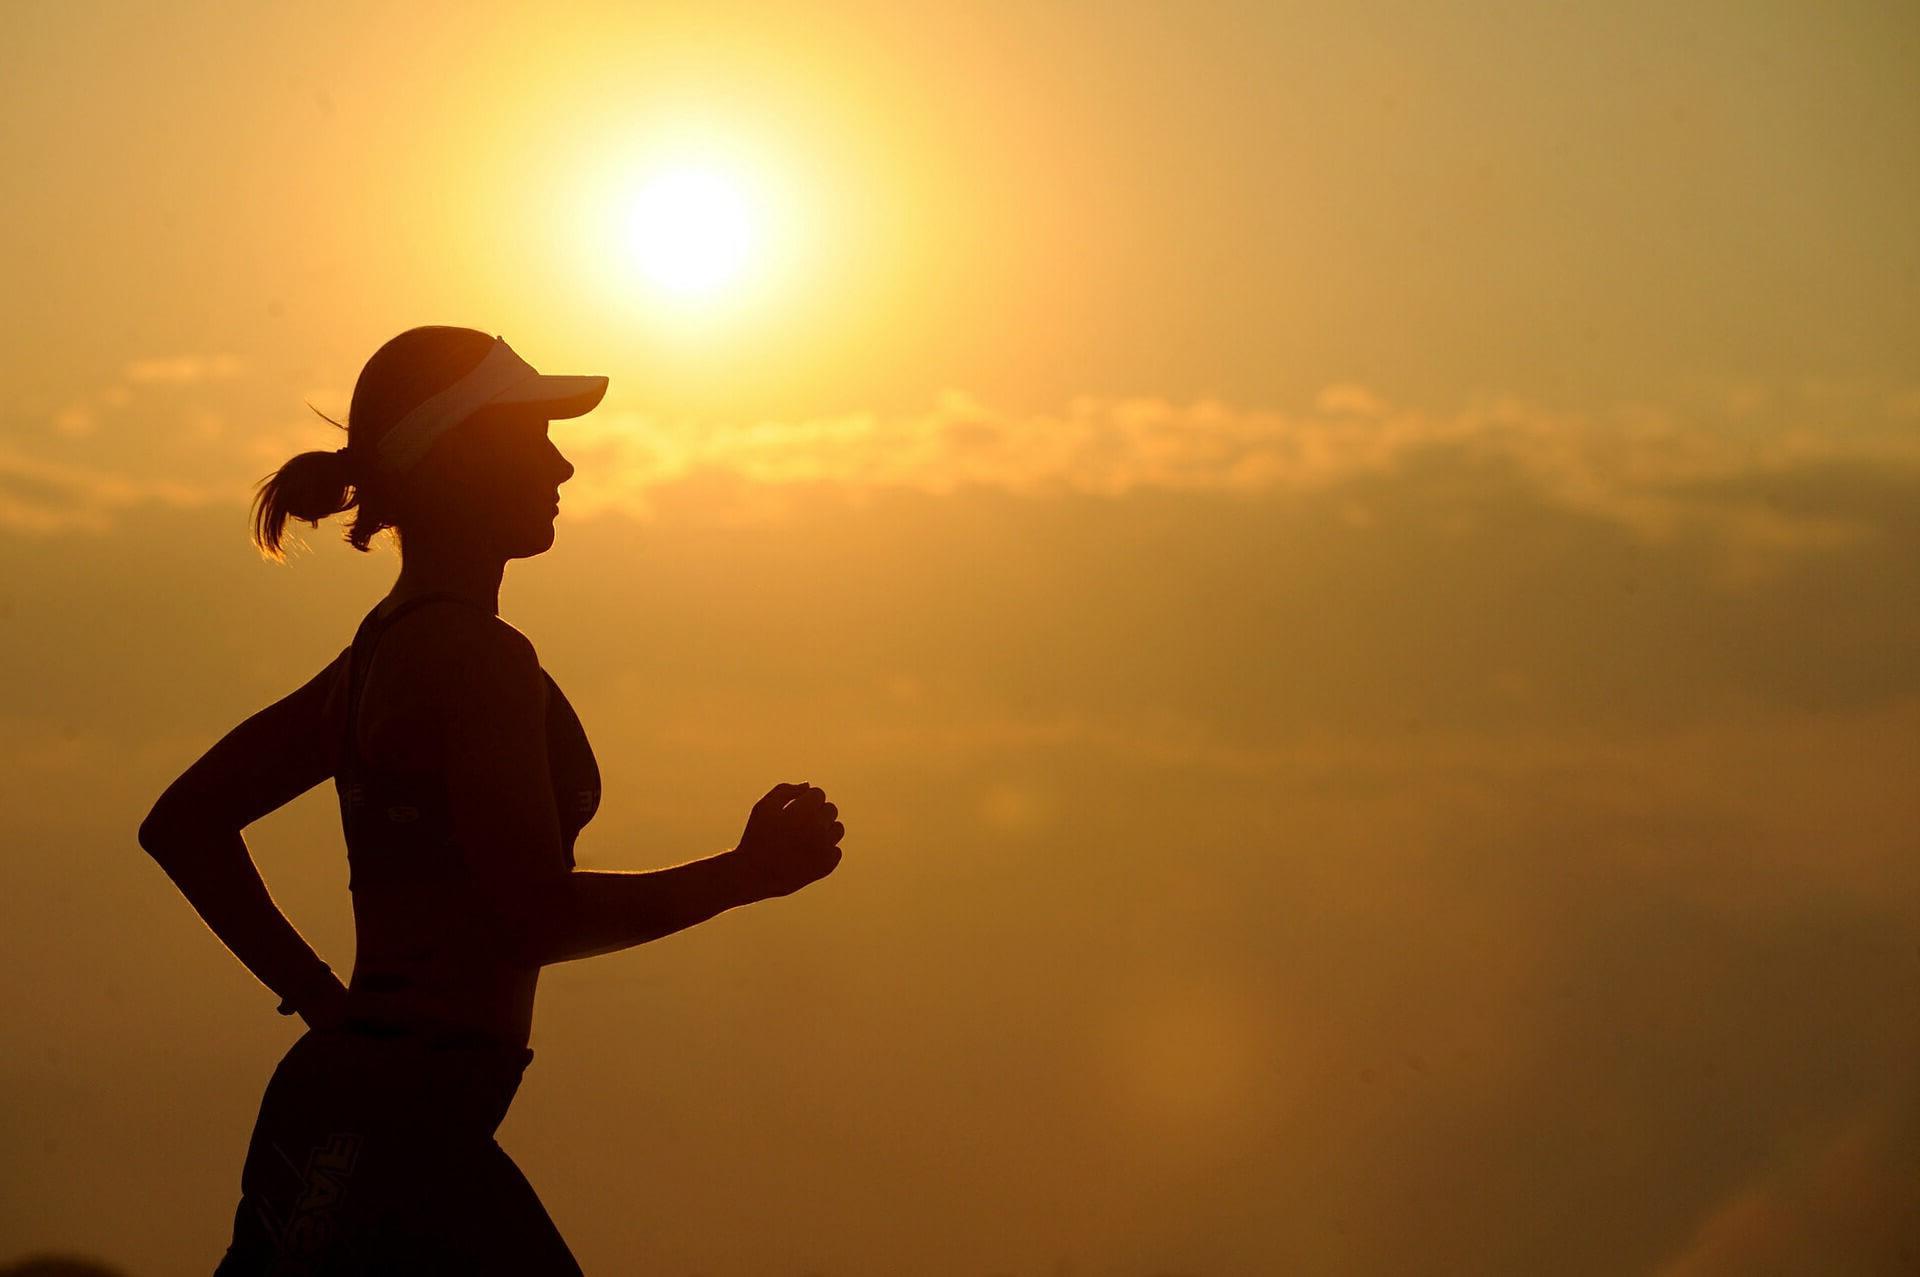 femme, Runner, exercice, en cours d'exécution, Sun, Coucher de soleil, ombre - Fonds d'écran HD - Professor-falken.com